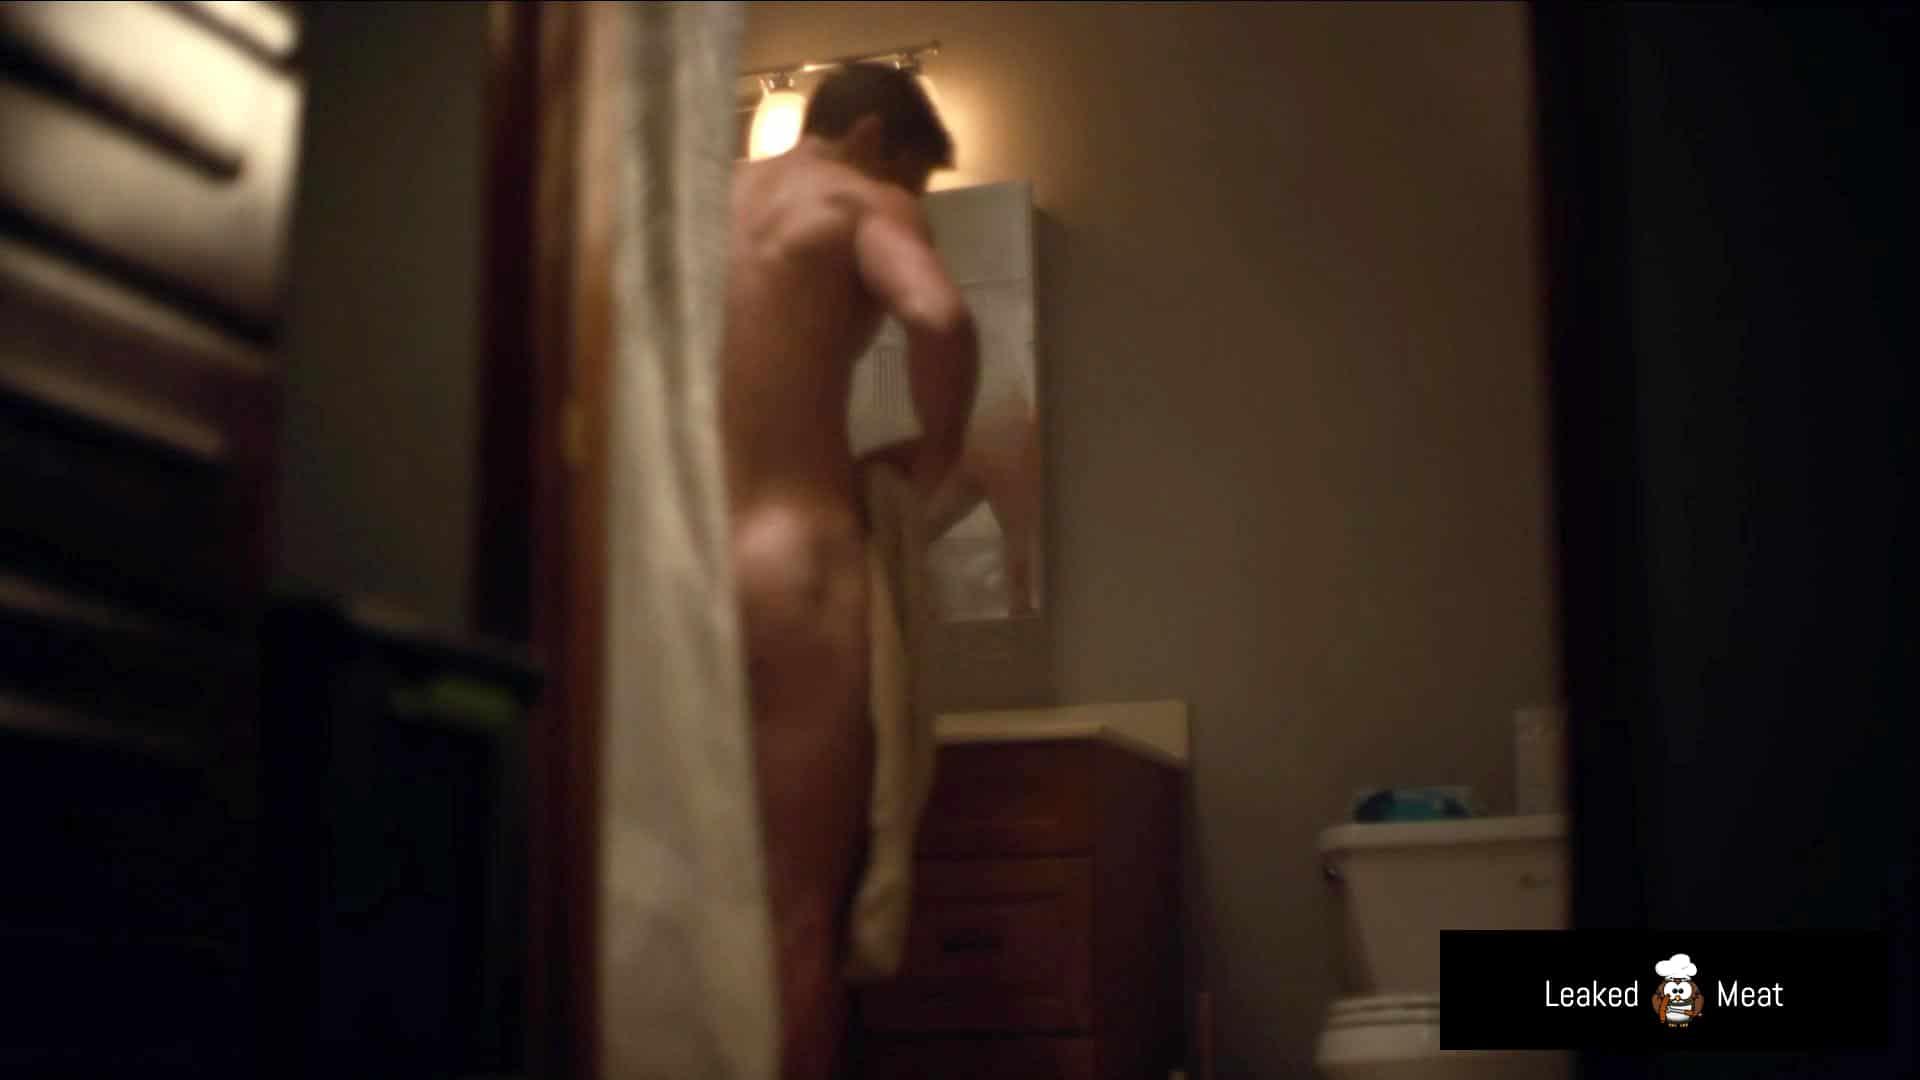 Jacob Elordi naked   LeakedMeat 18